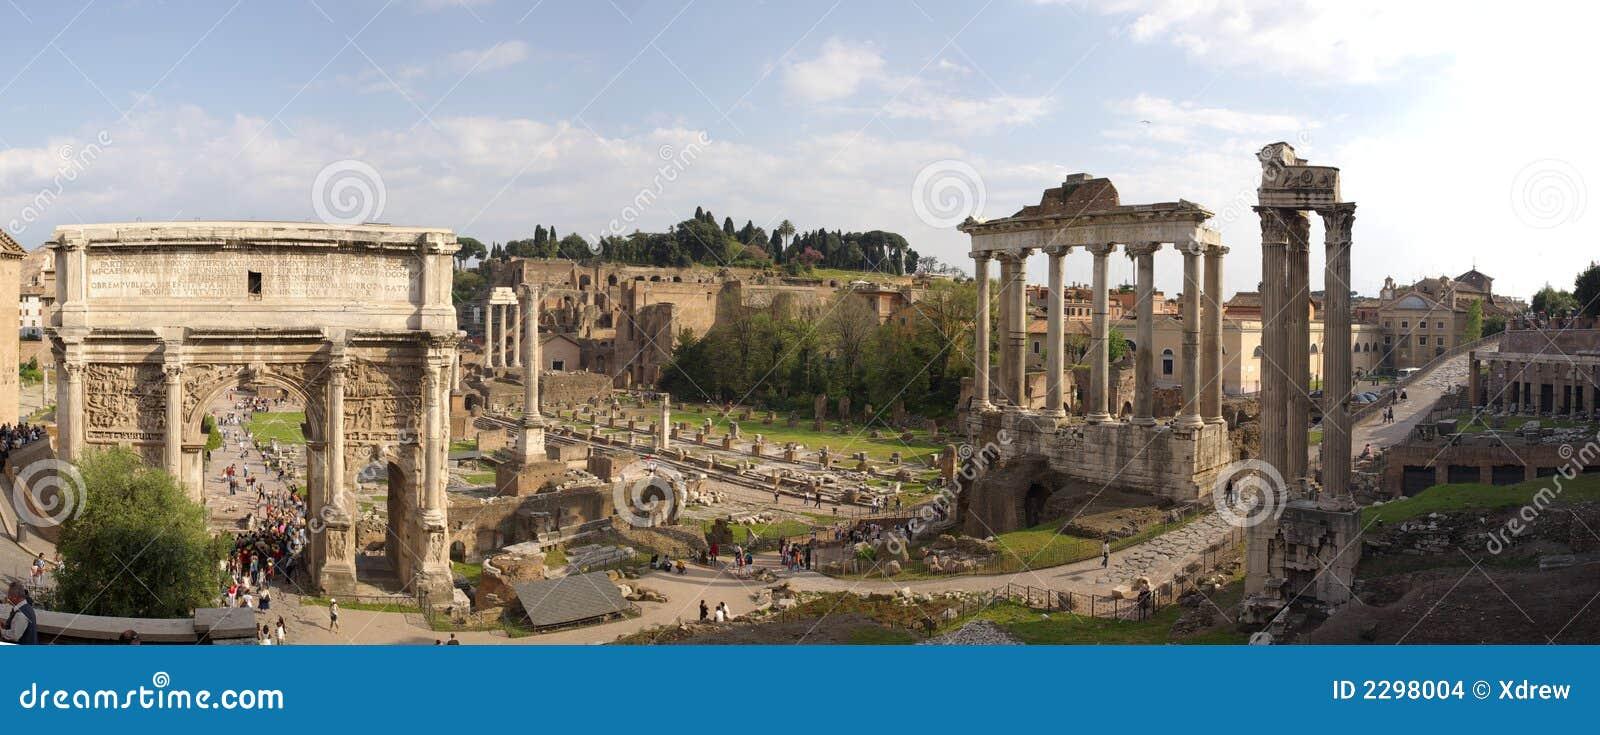 Panorama dos ruines de Roma